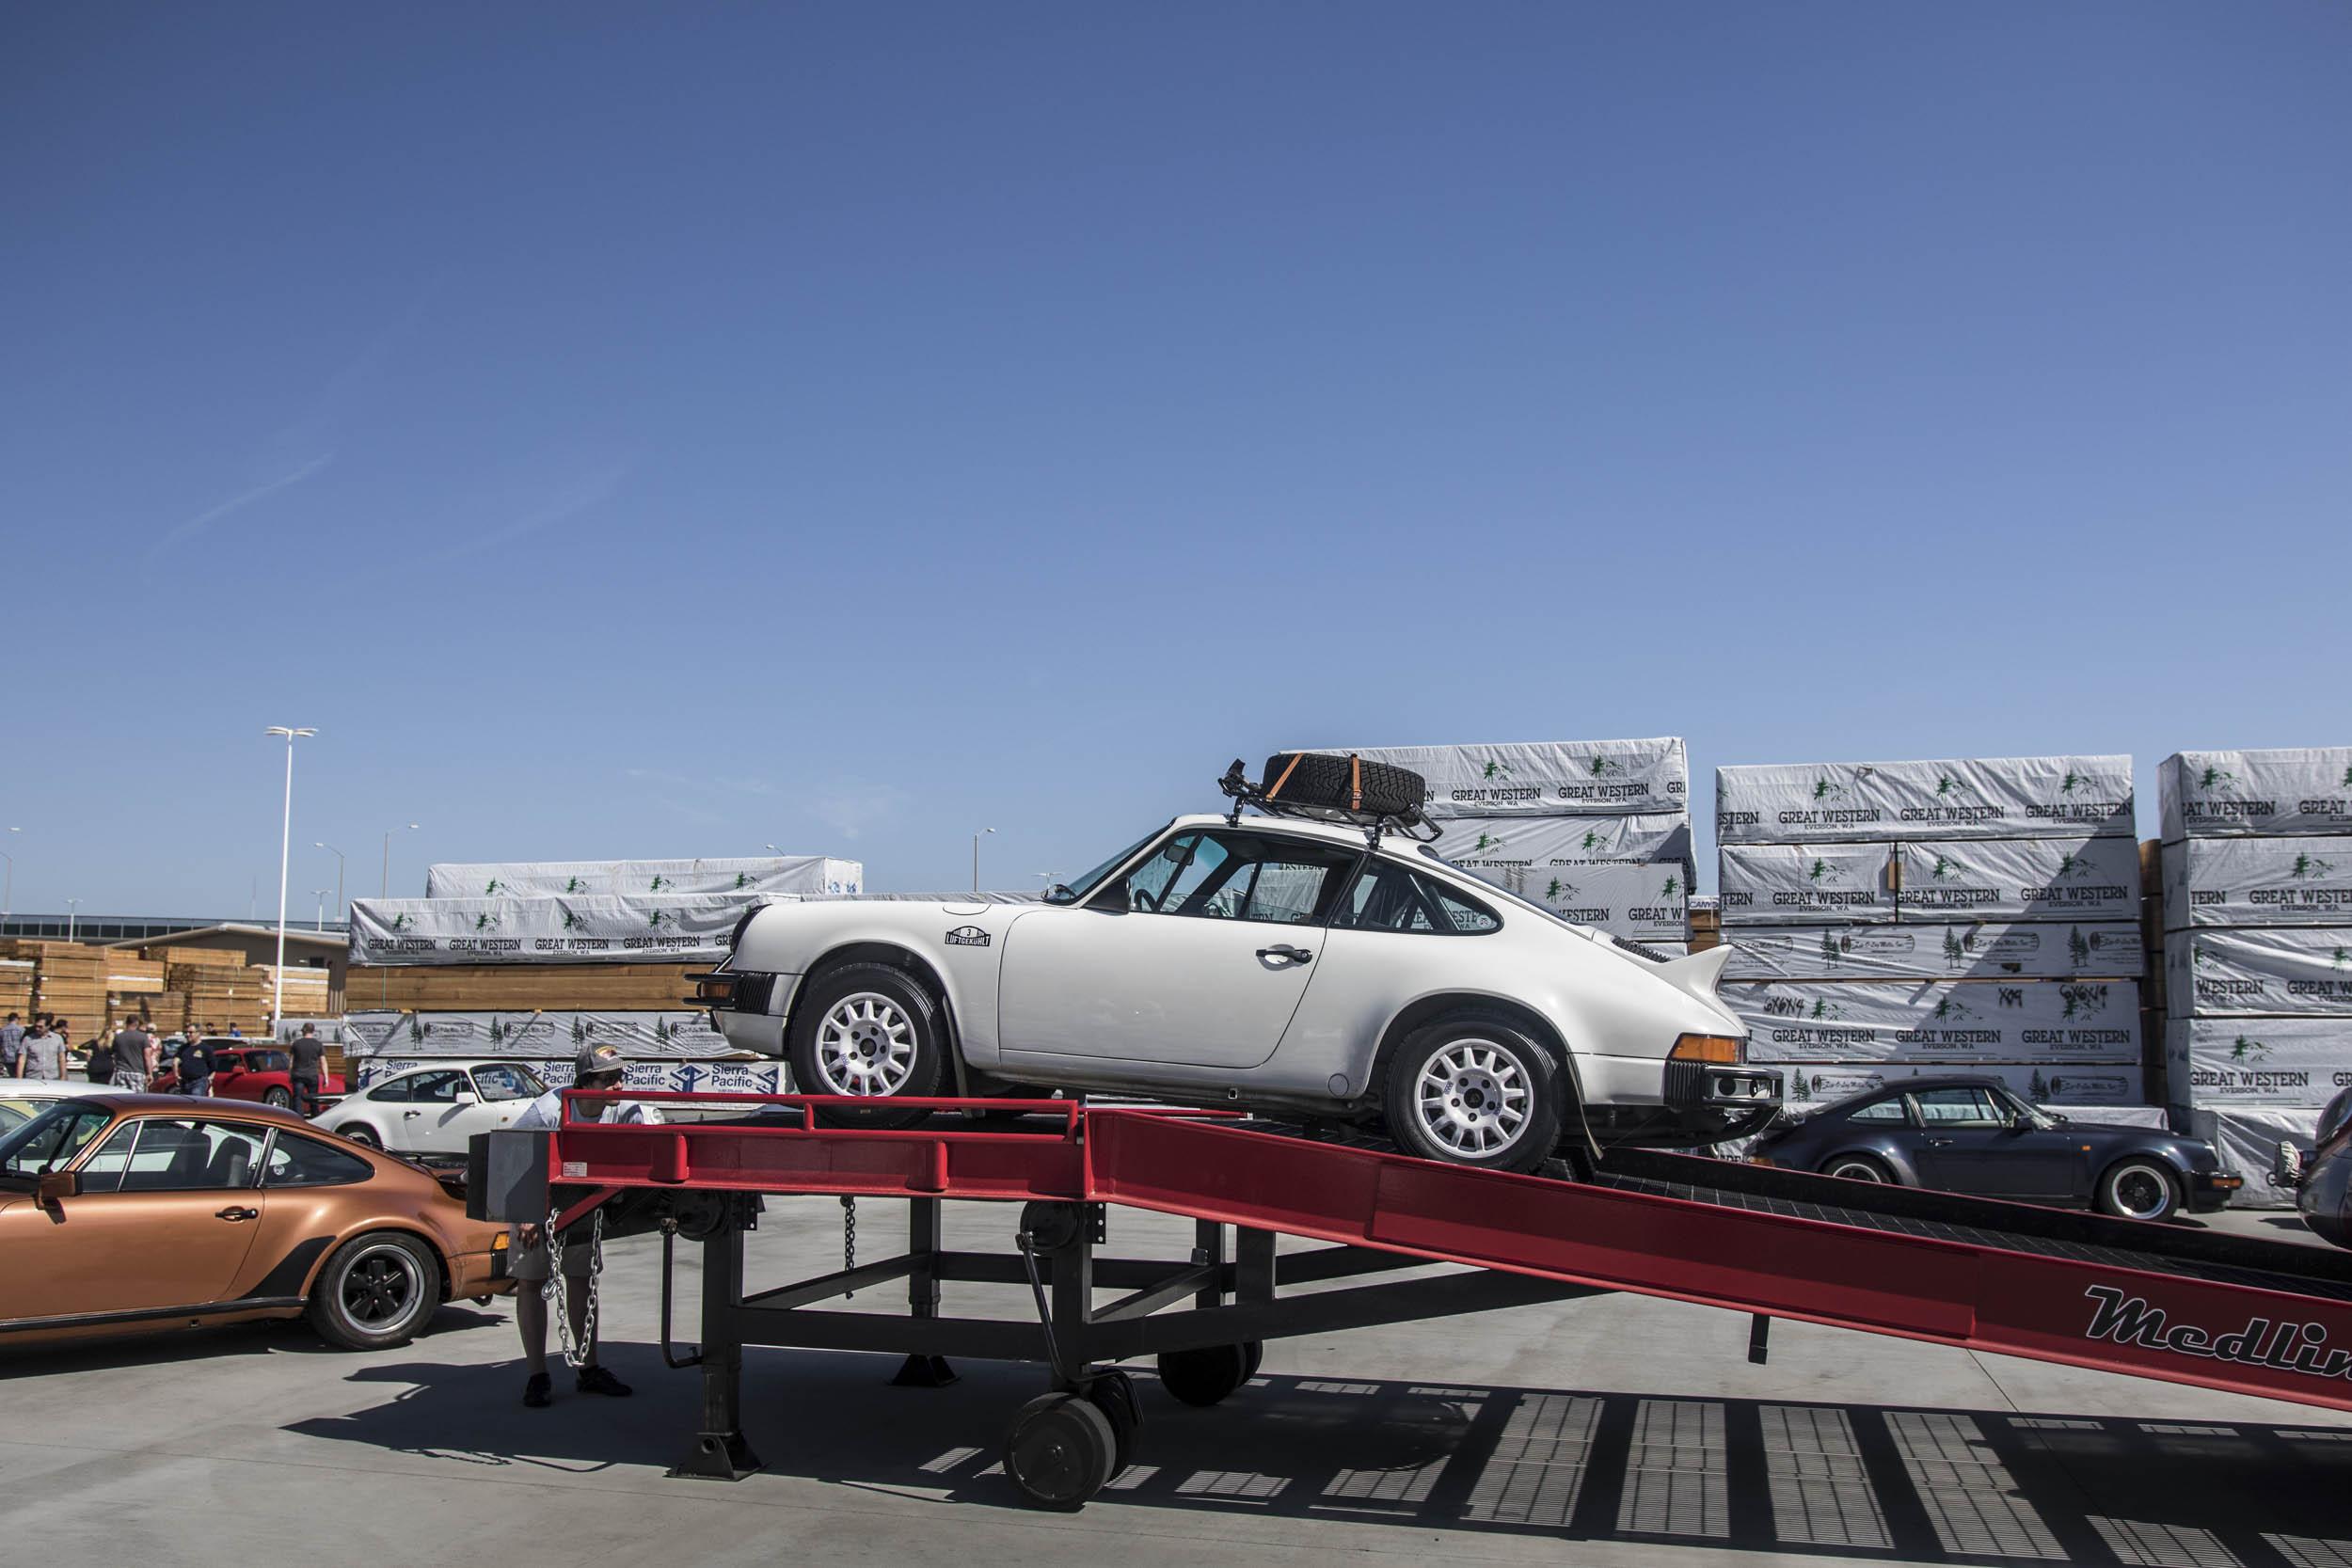 Porsche Safari 911 at Luftgekühlt on a mover